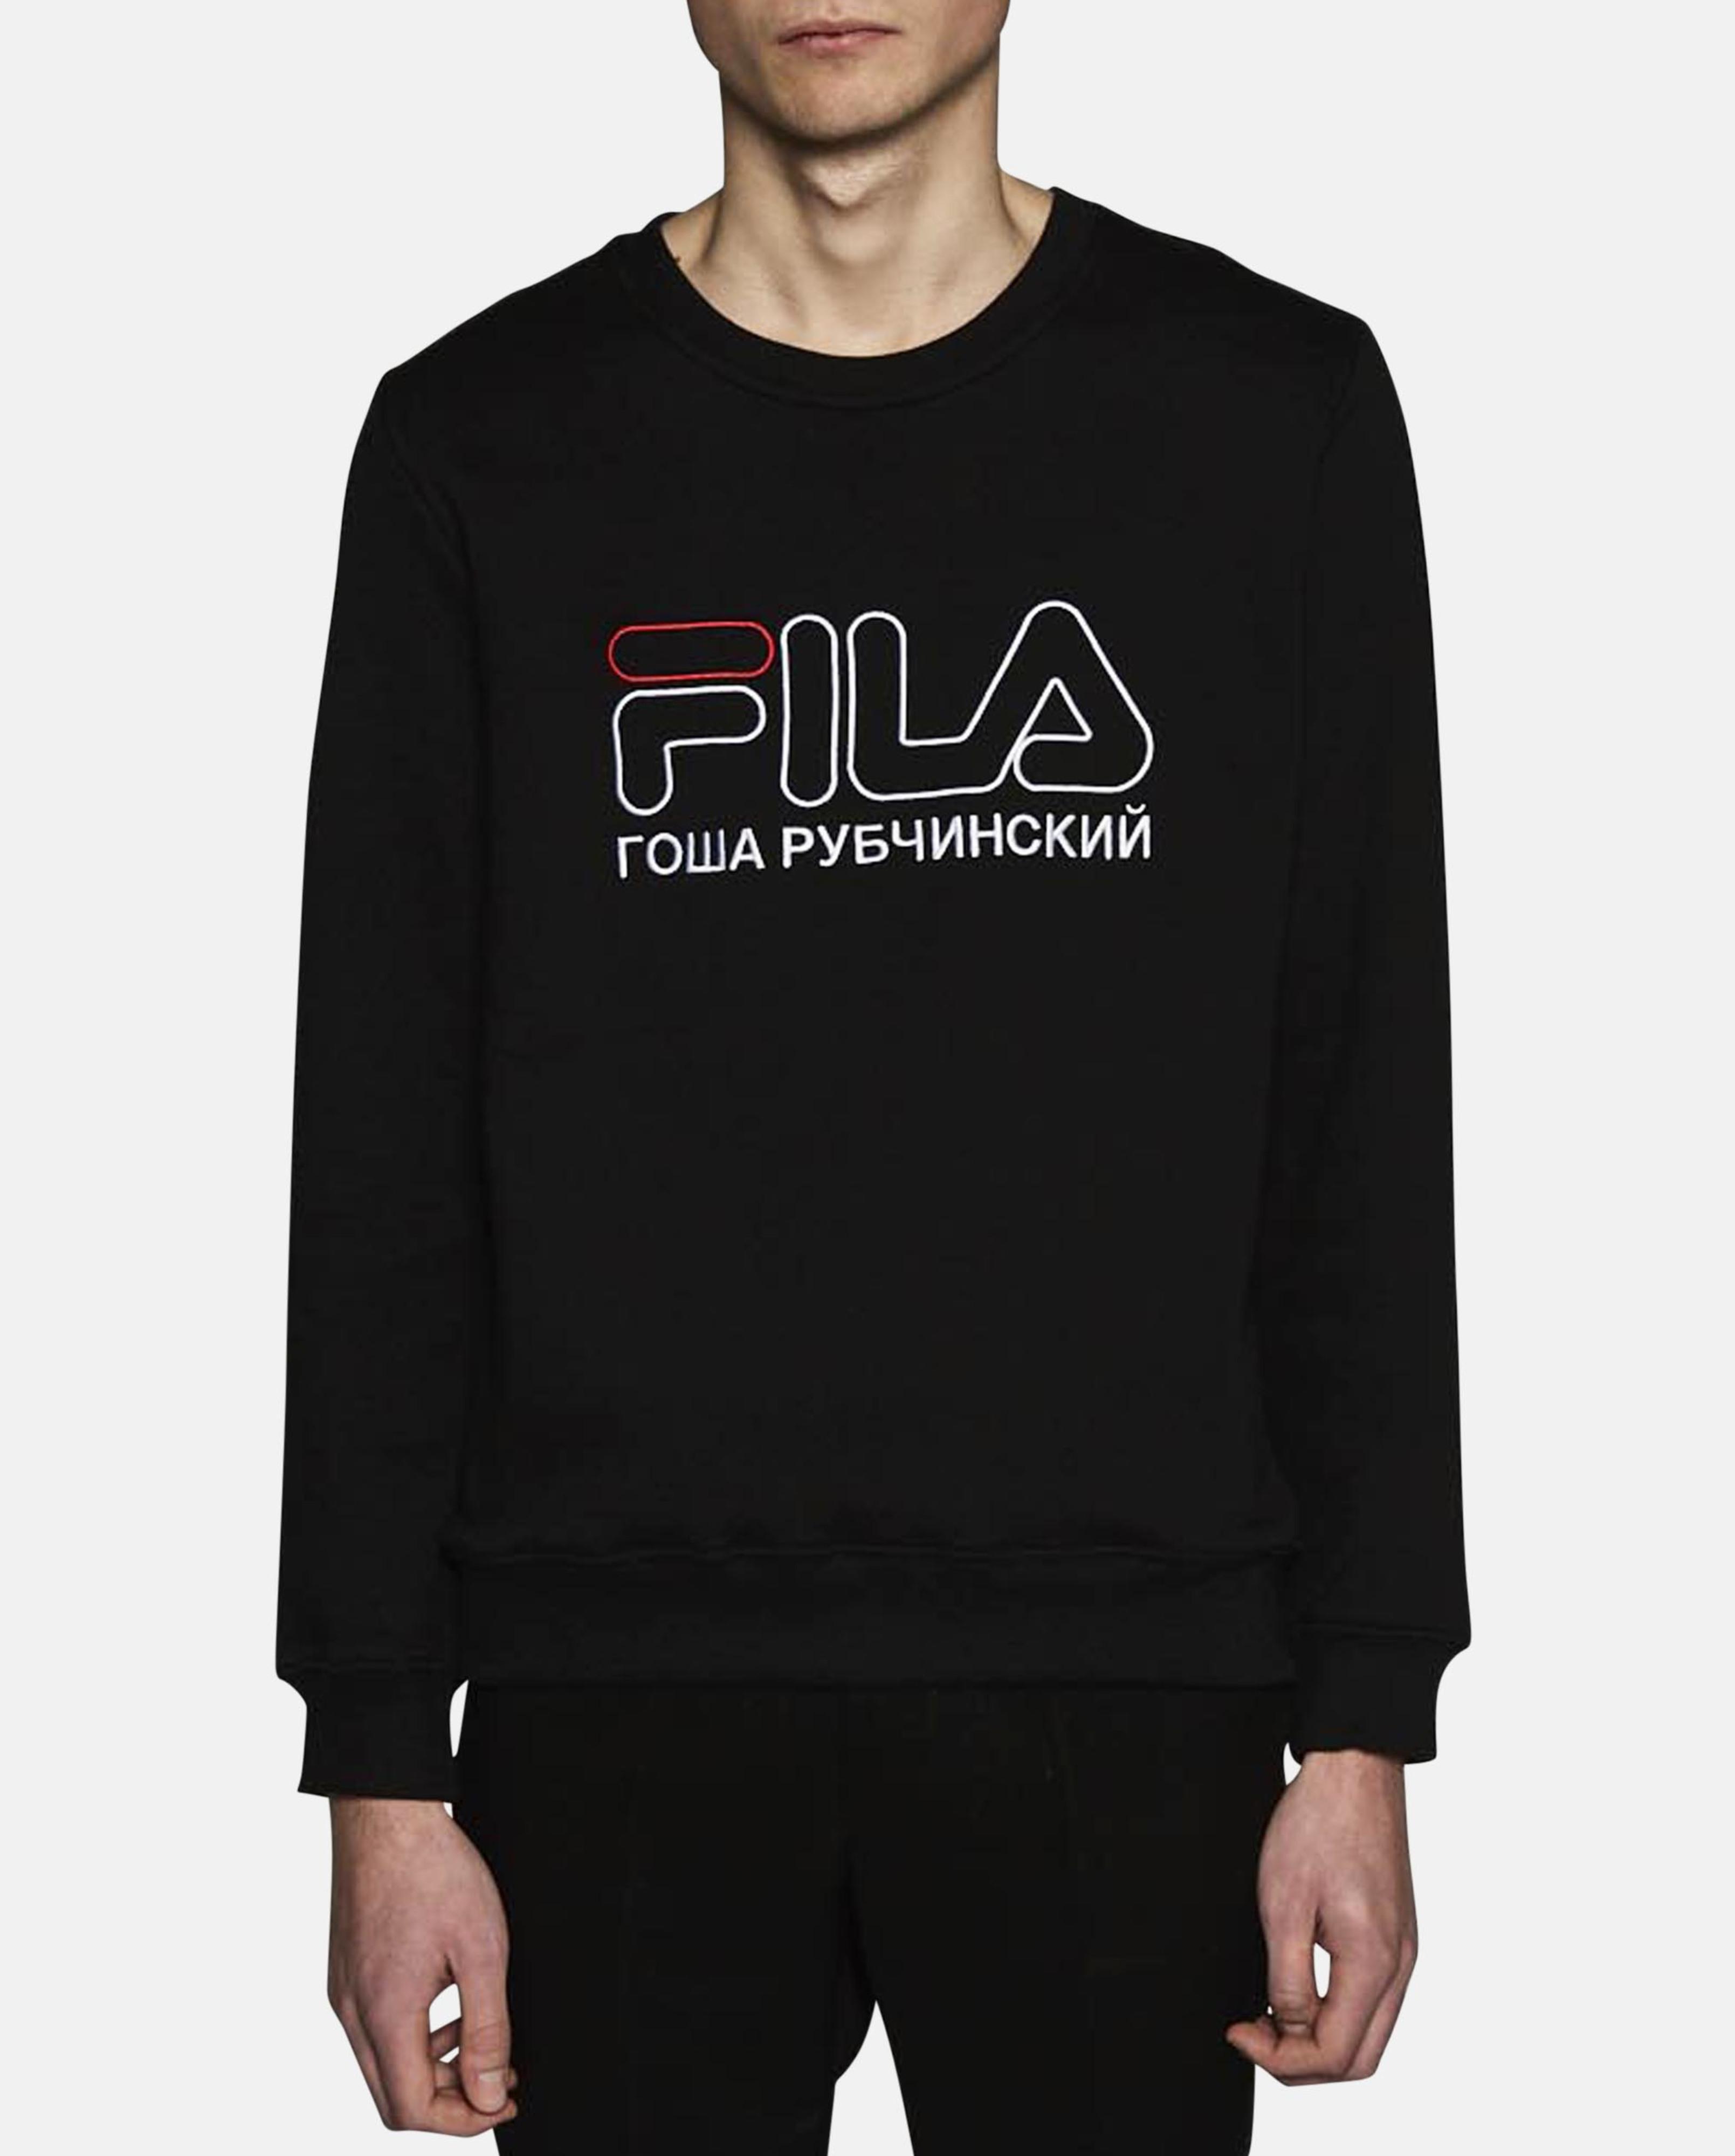 2f82a2e5aa1 Sweatshirt Gosha Fila Men Black Rubchinskiy For Lyst In tzPSwxqq